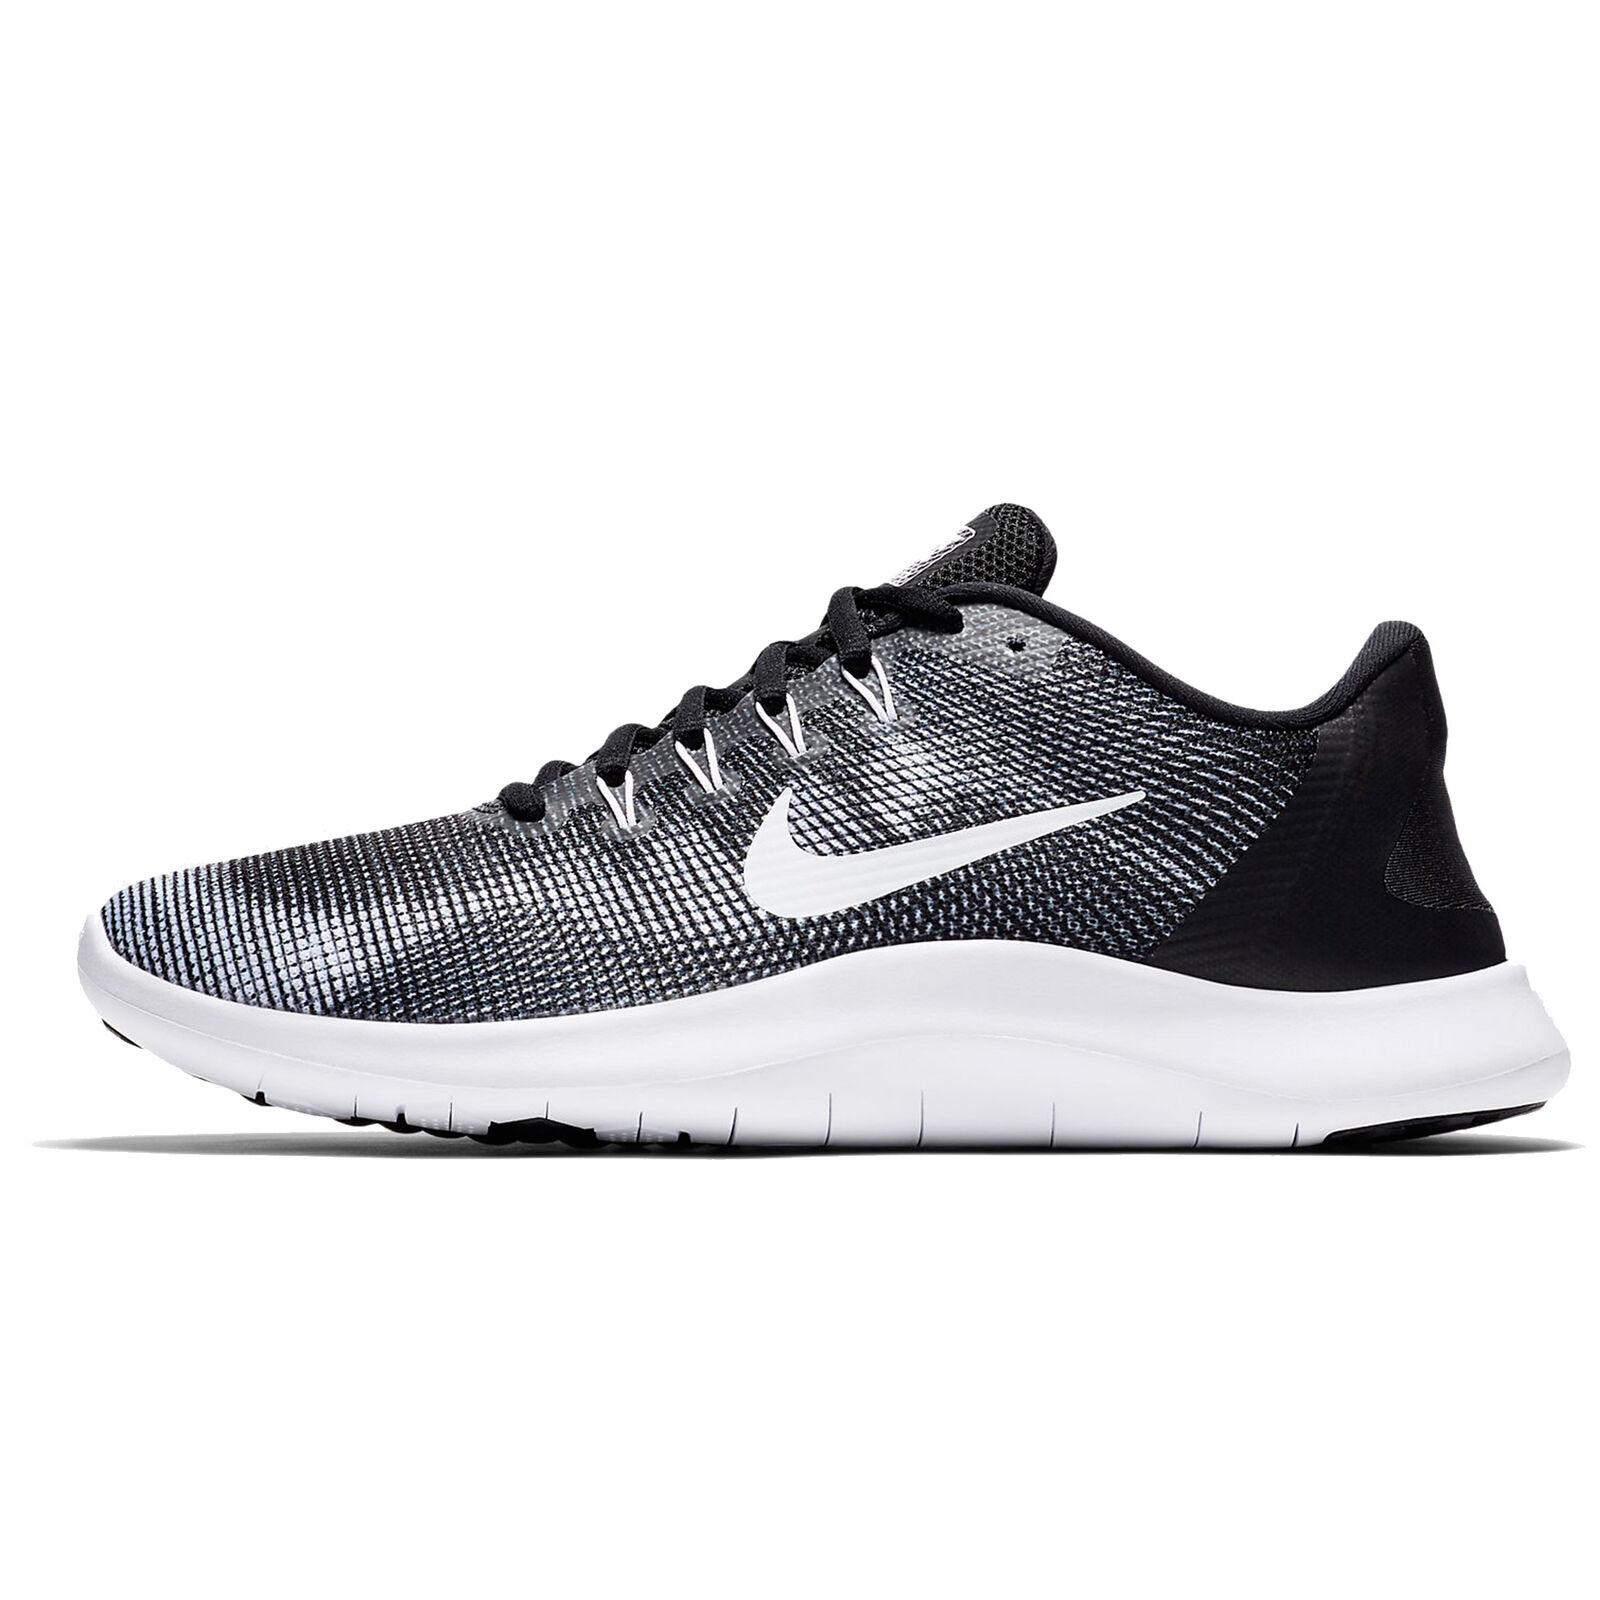 Nike Flex 2018 Rn AA7397-001 Loisir Course Course Chaussure de Course